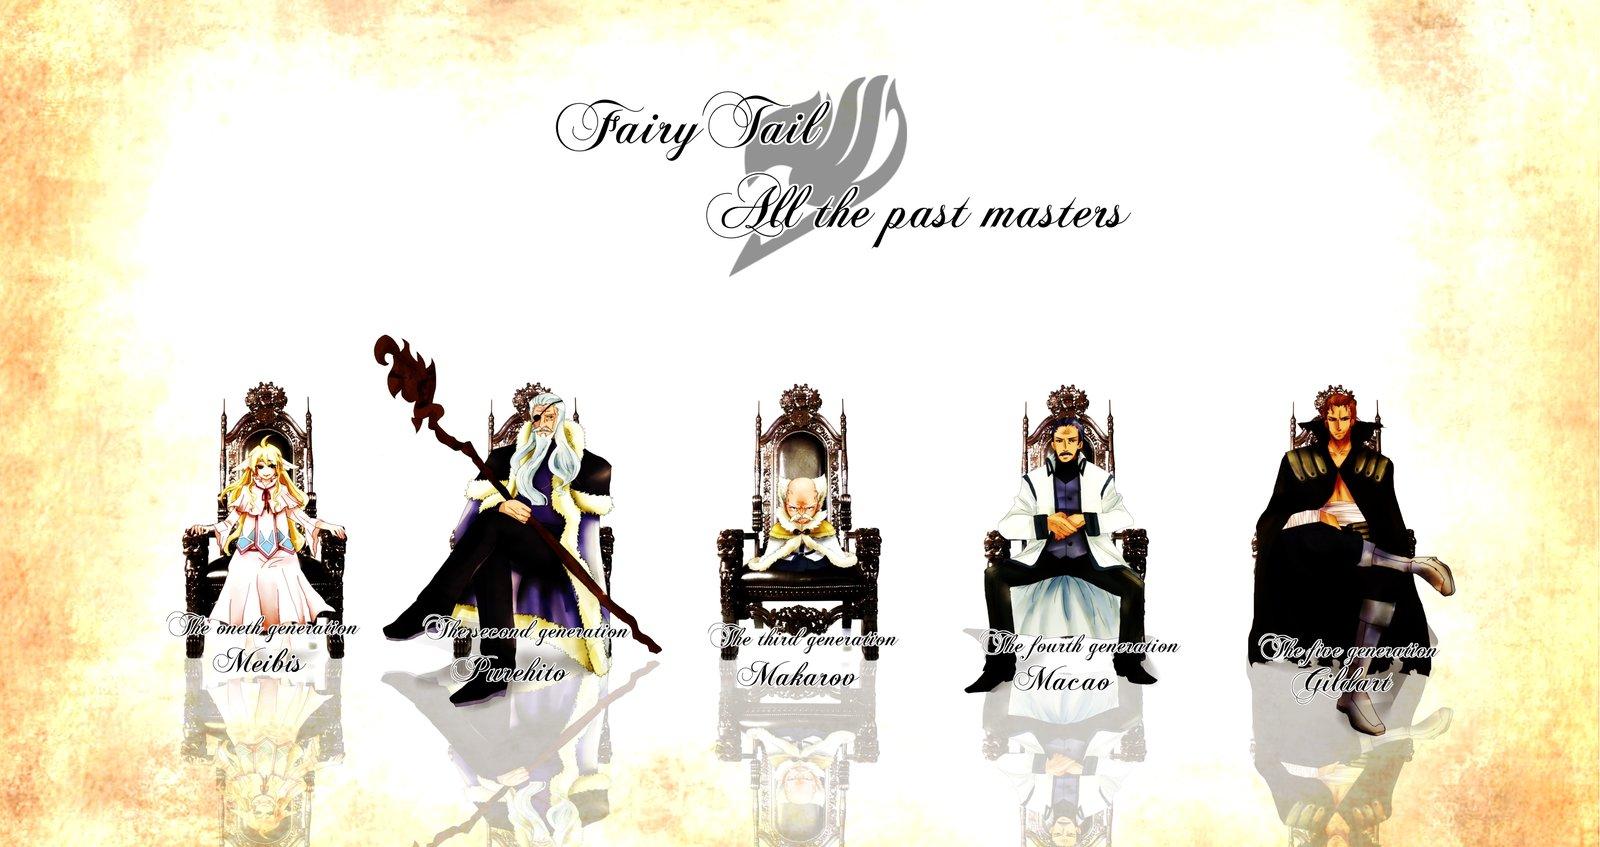 Fairy_Tail_full_1311920